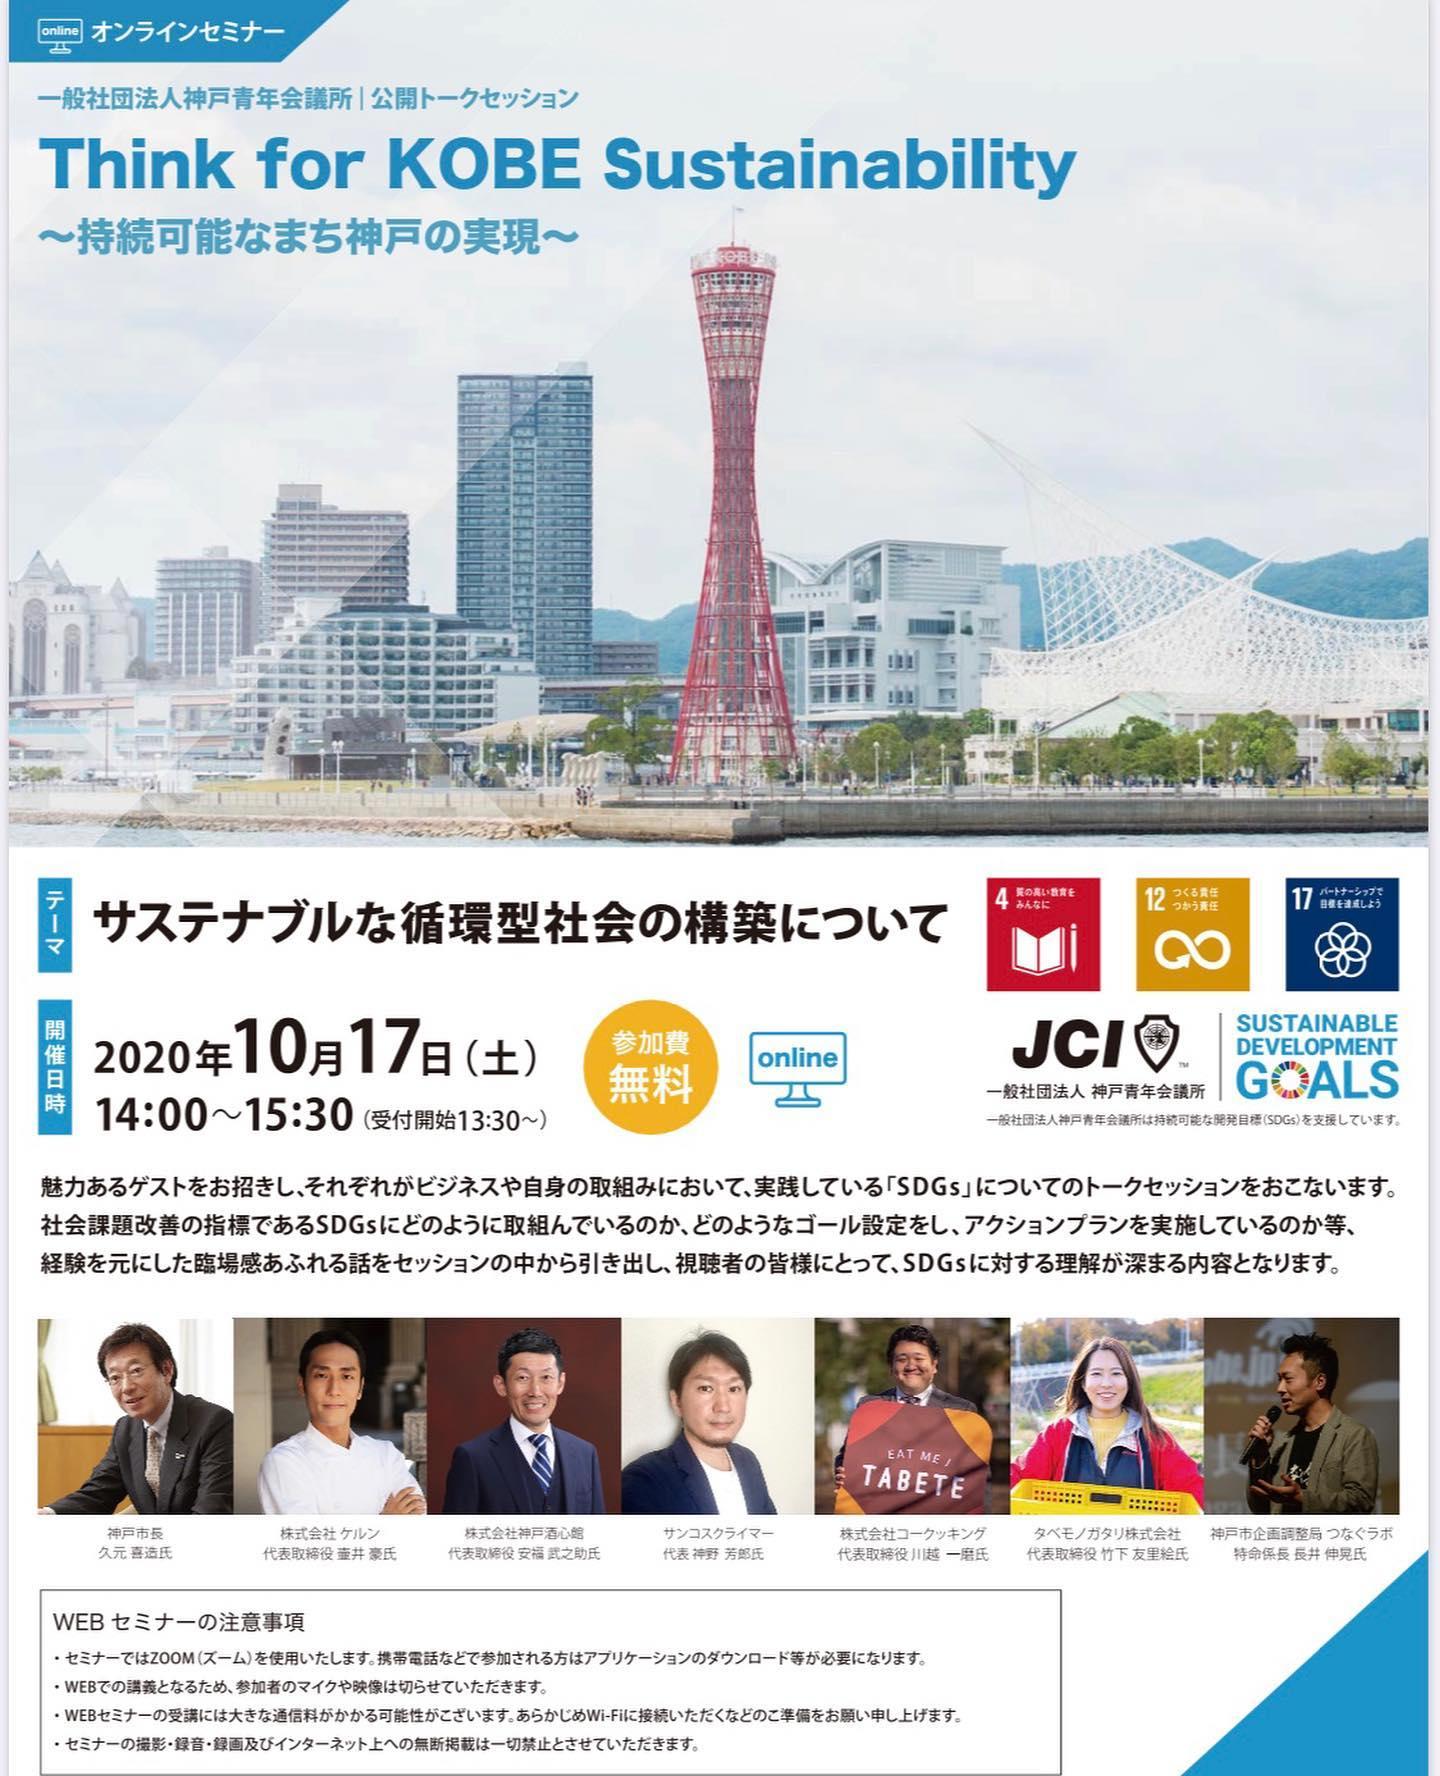 「Think for KOBE Sustainability~持続可能なまち神戸の実現~」に参加いたします